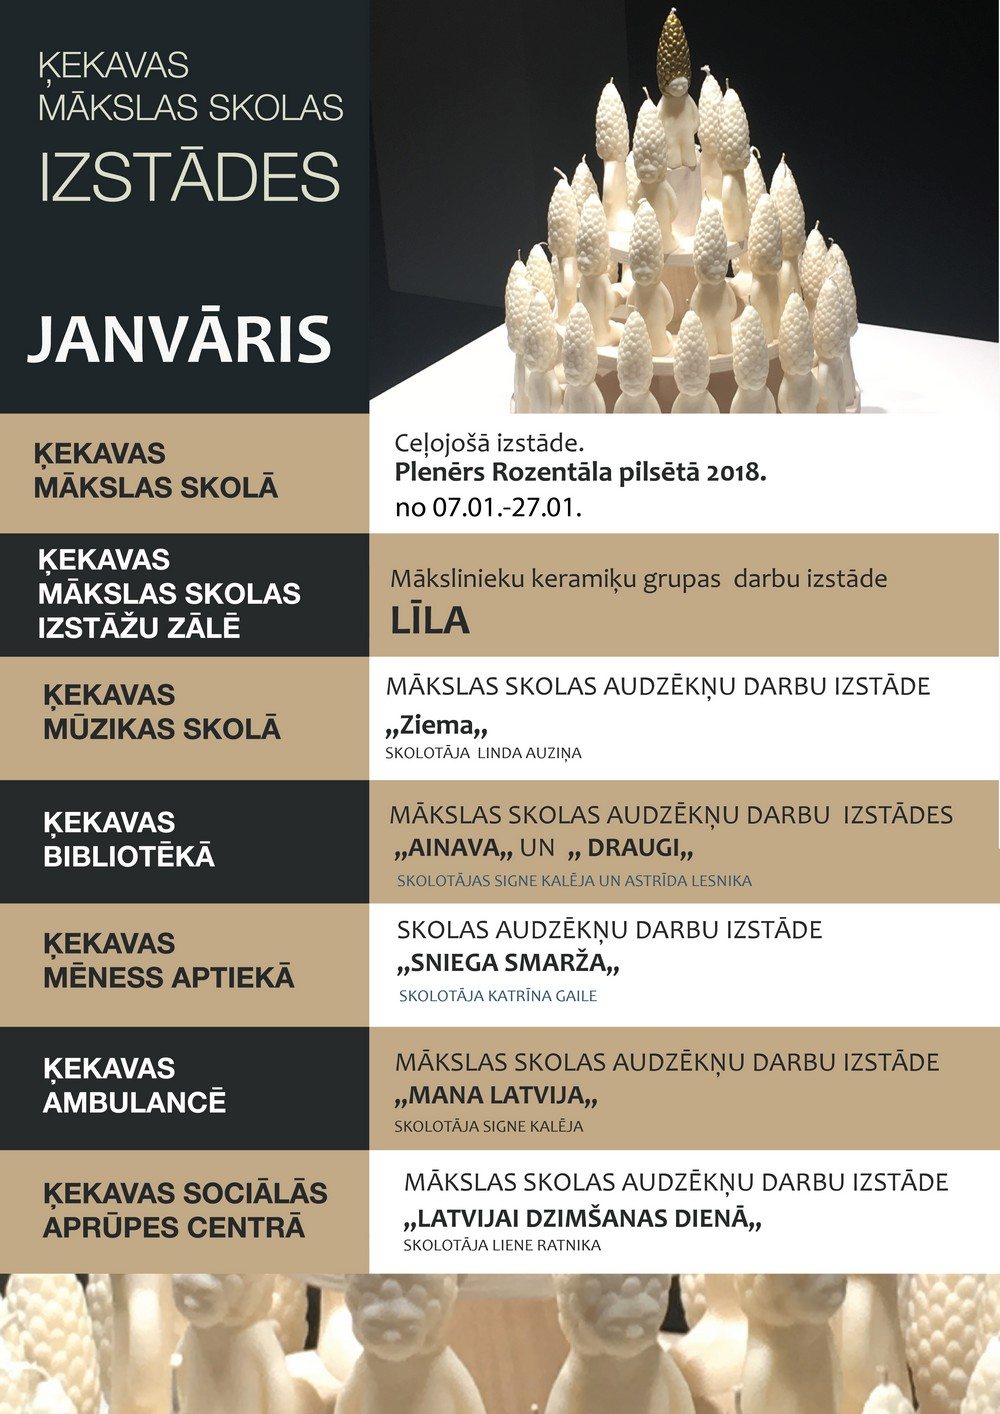 Izstades_janvaris 2019_ML